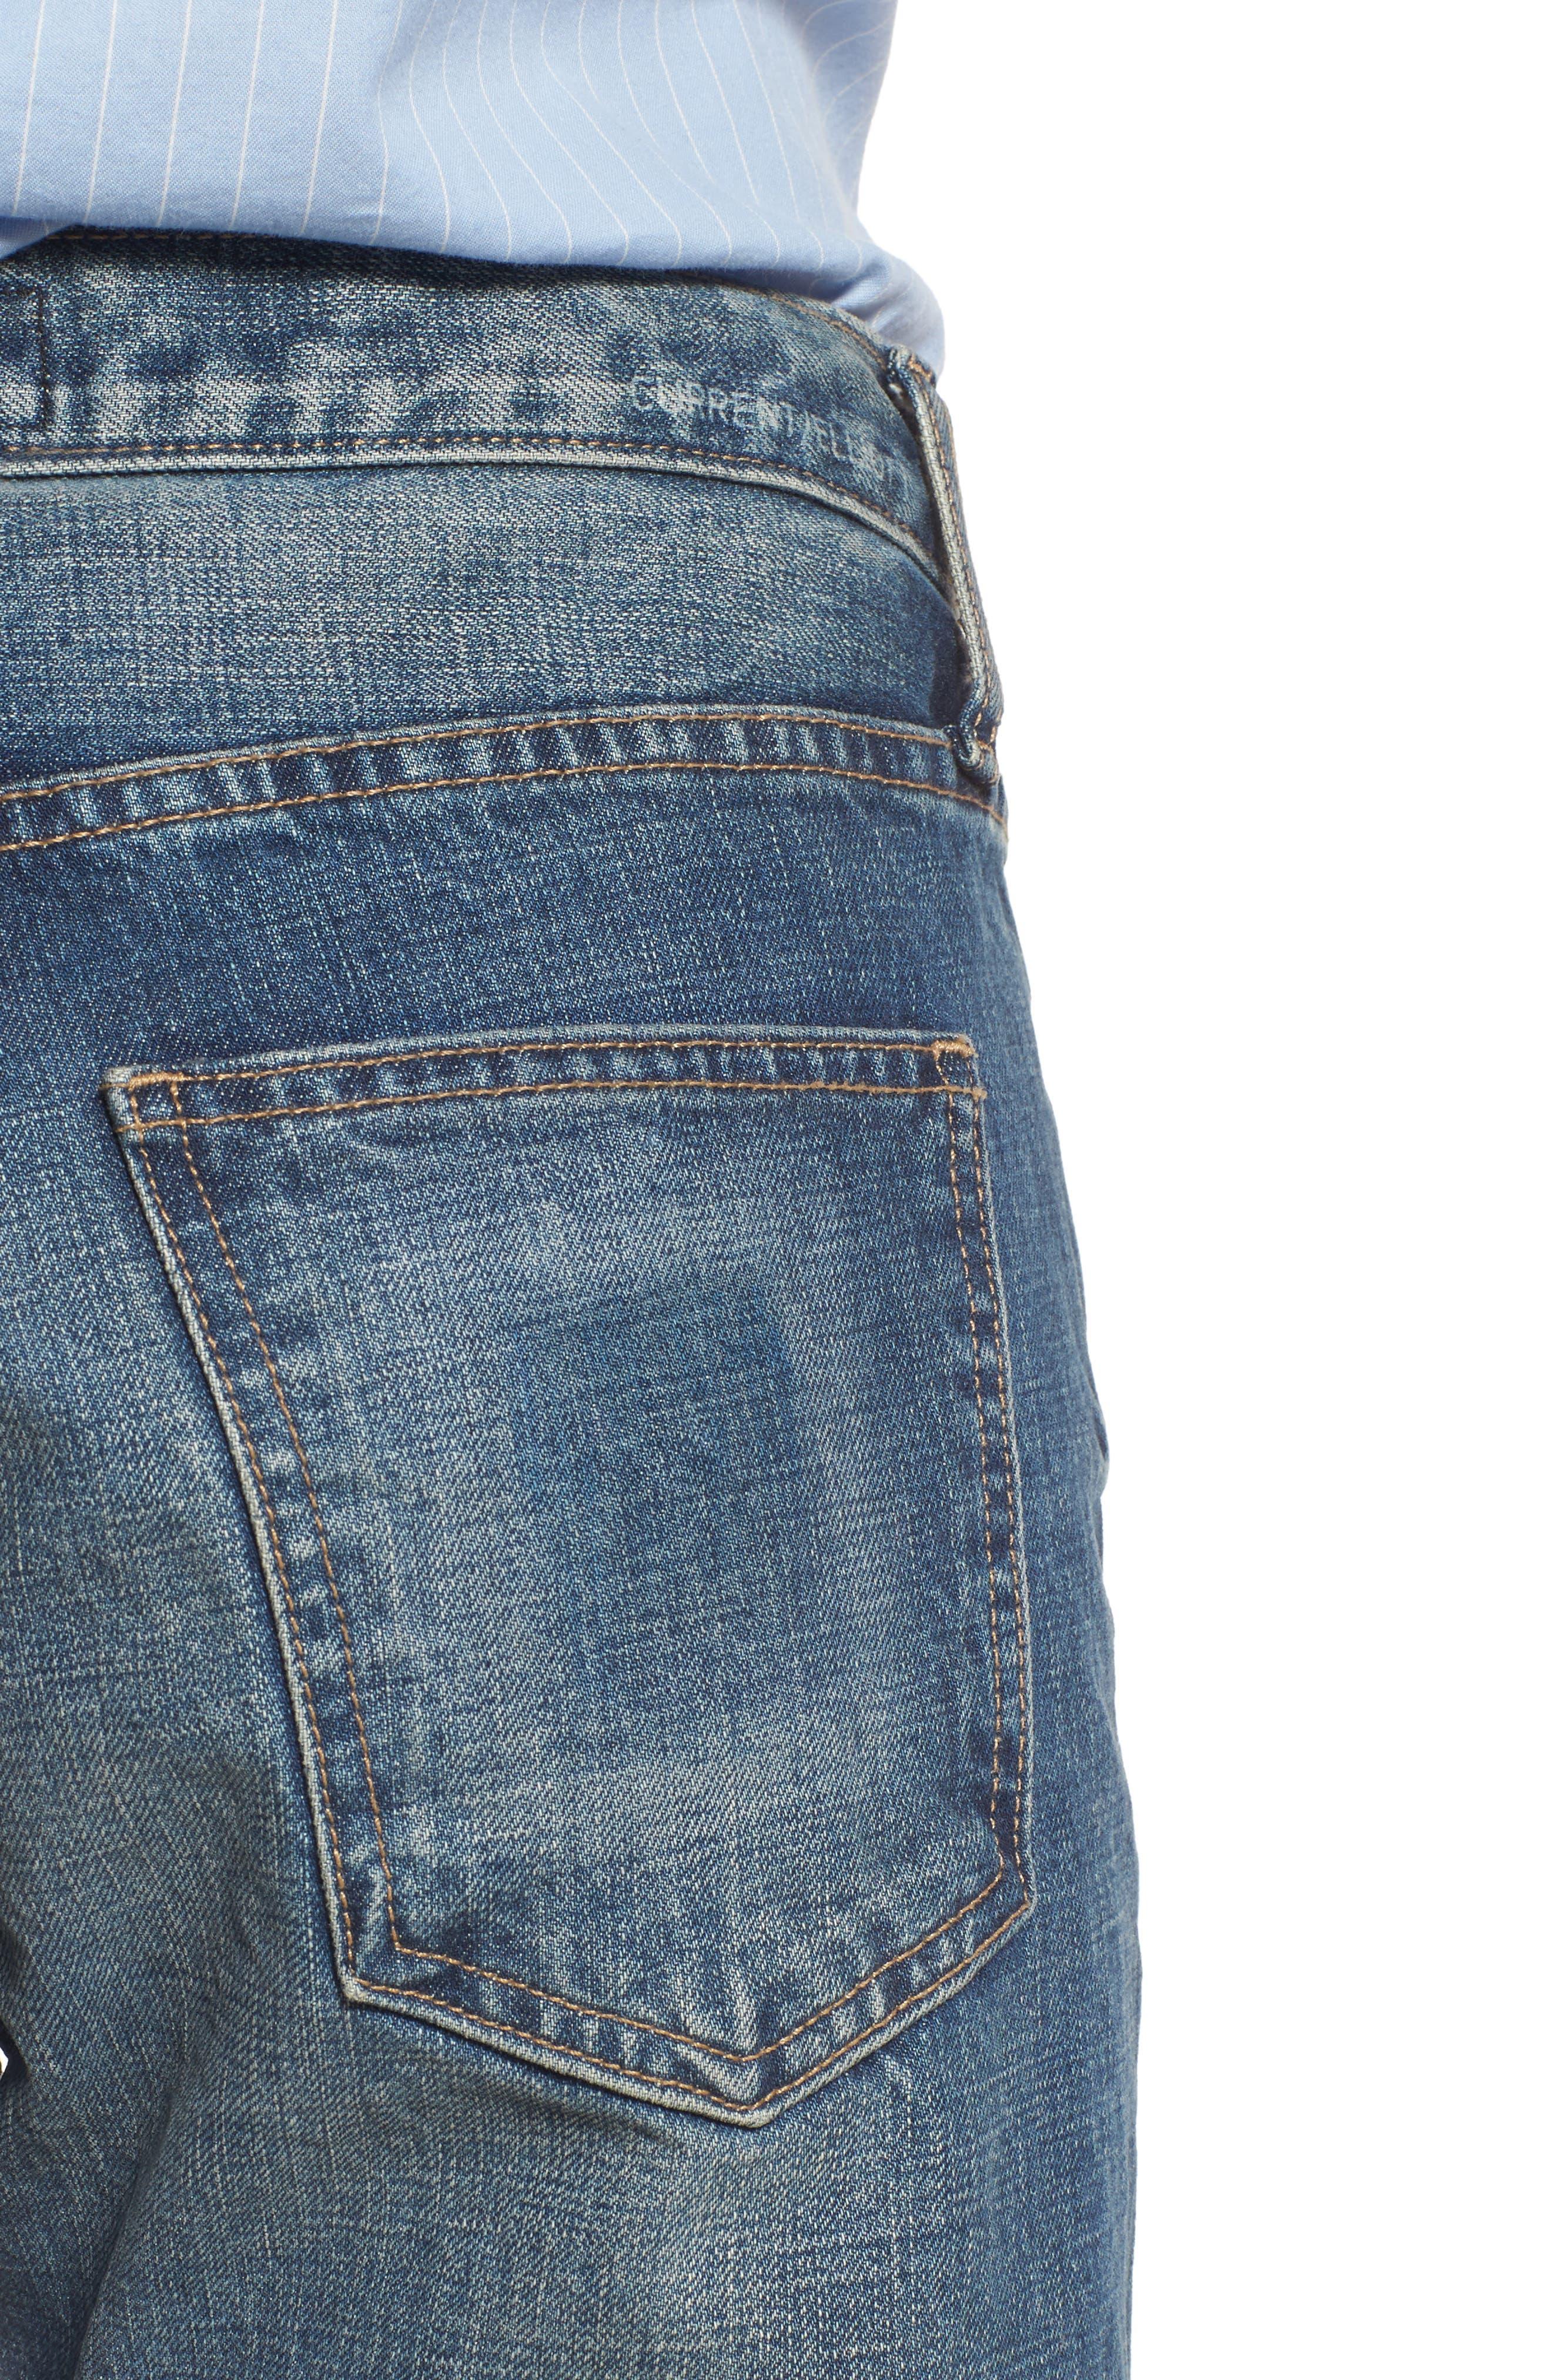 Alternate Image 4  - Current/Elliott The Selvedge High Waist Crop Jeans (Hemet)